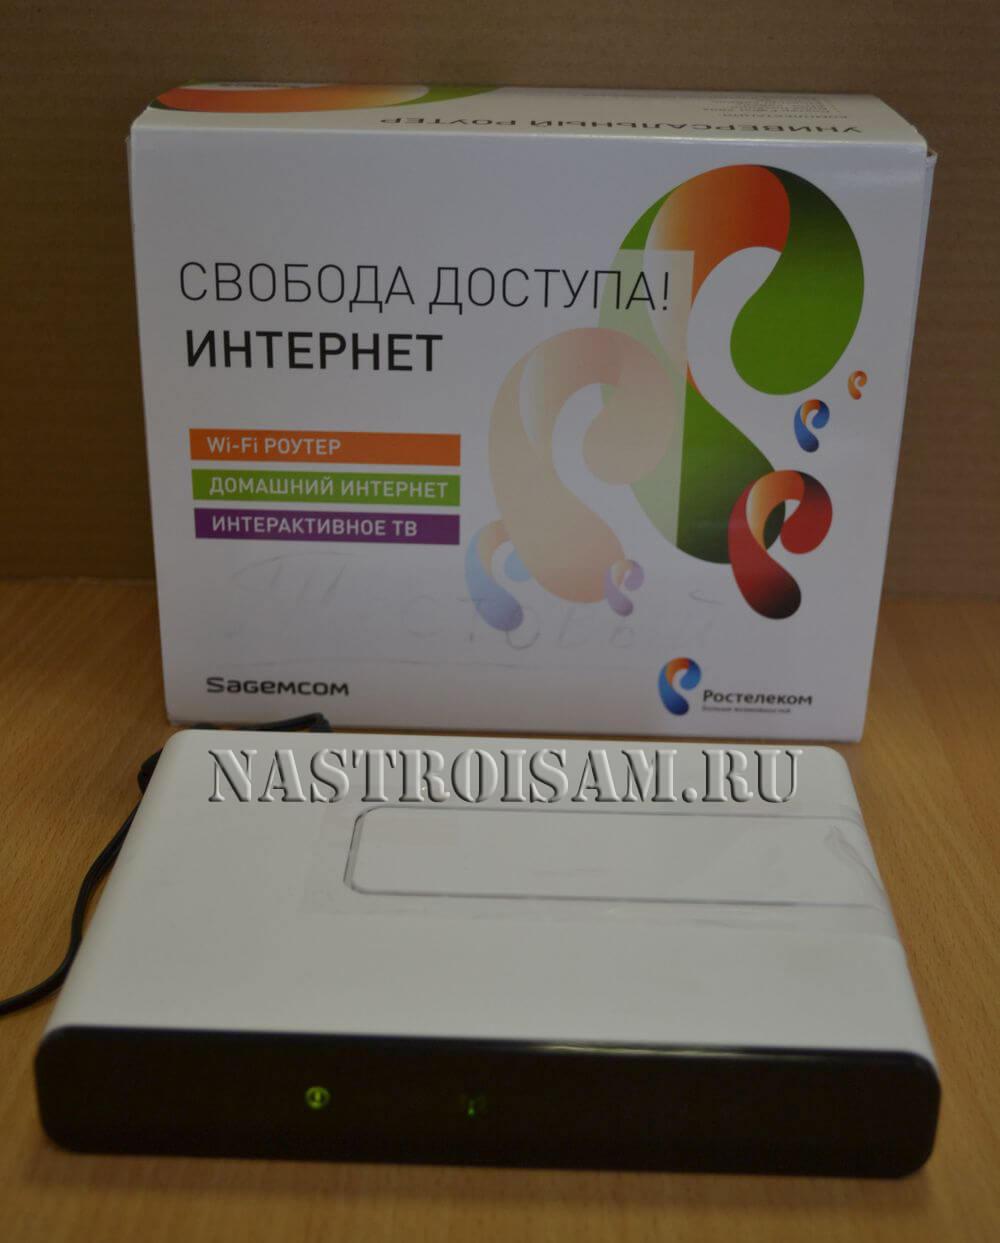 маршрутизатор ростелеком sagemcom fast 2804 v7